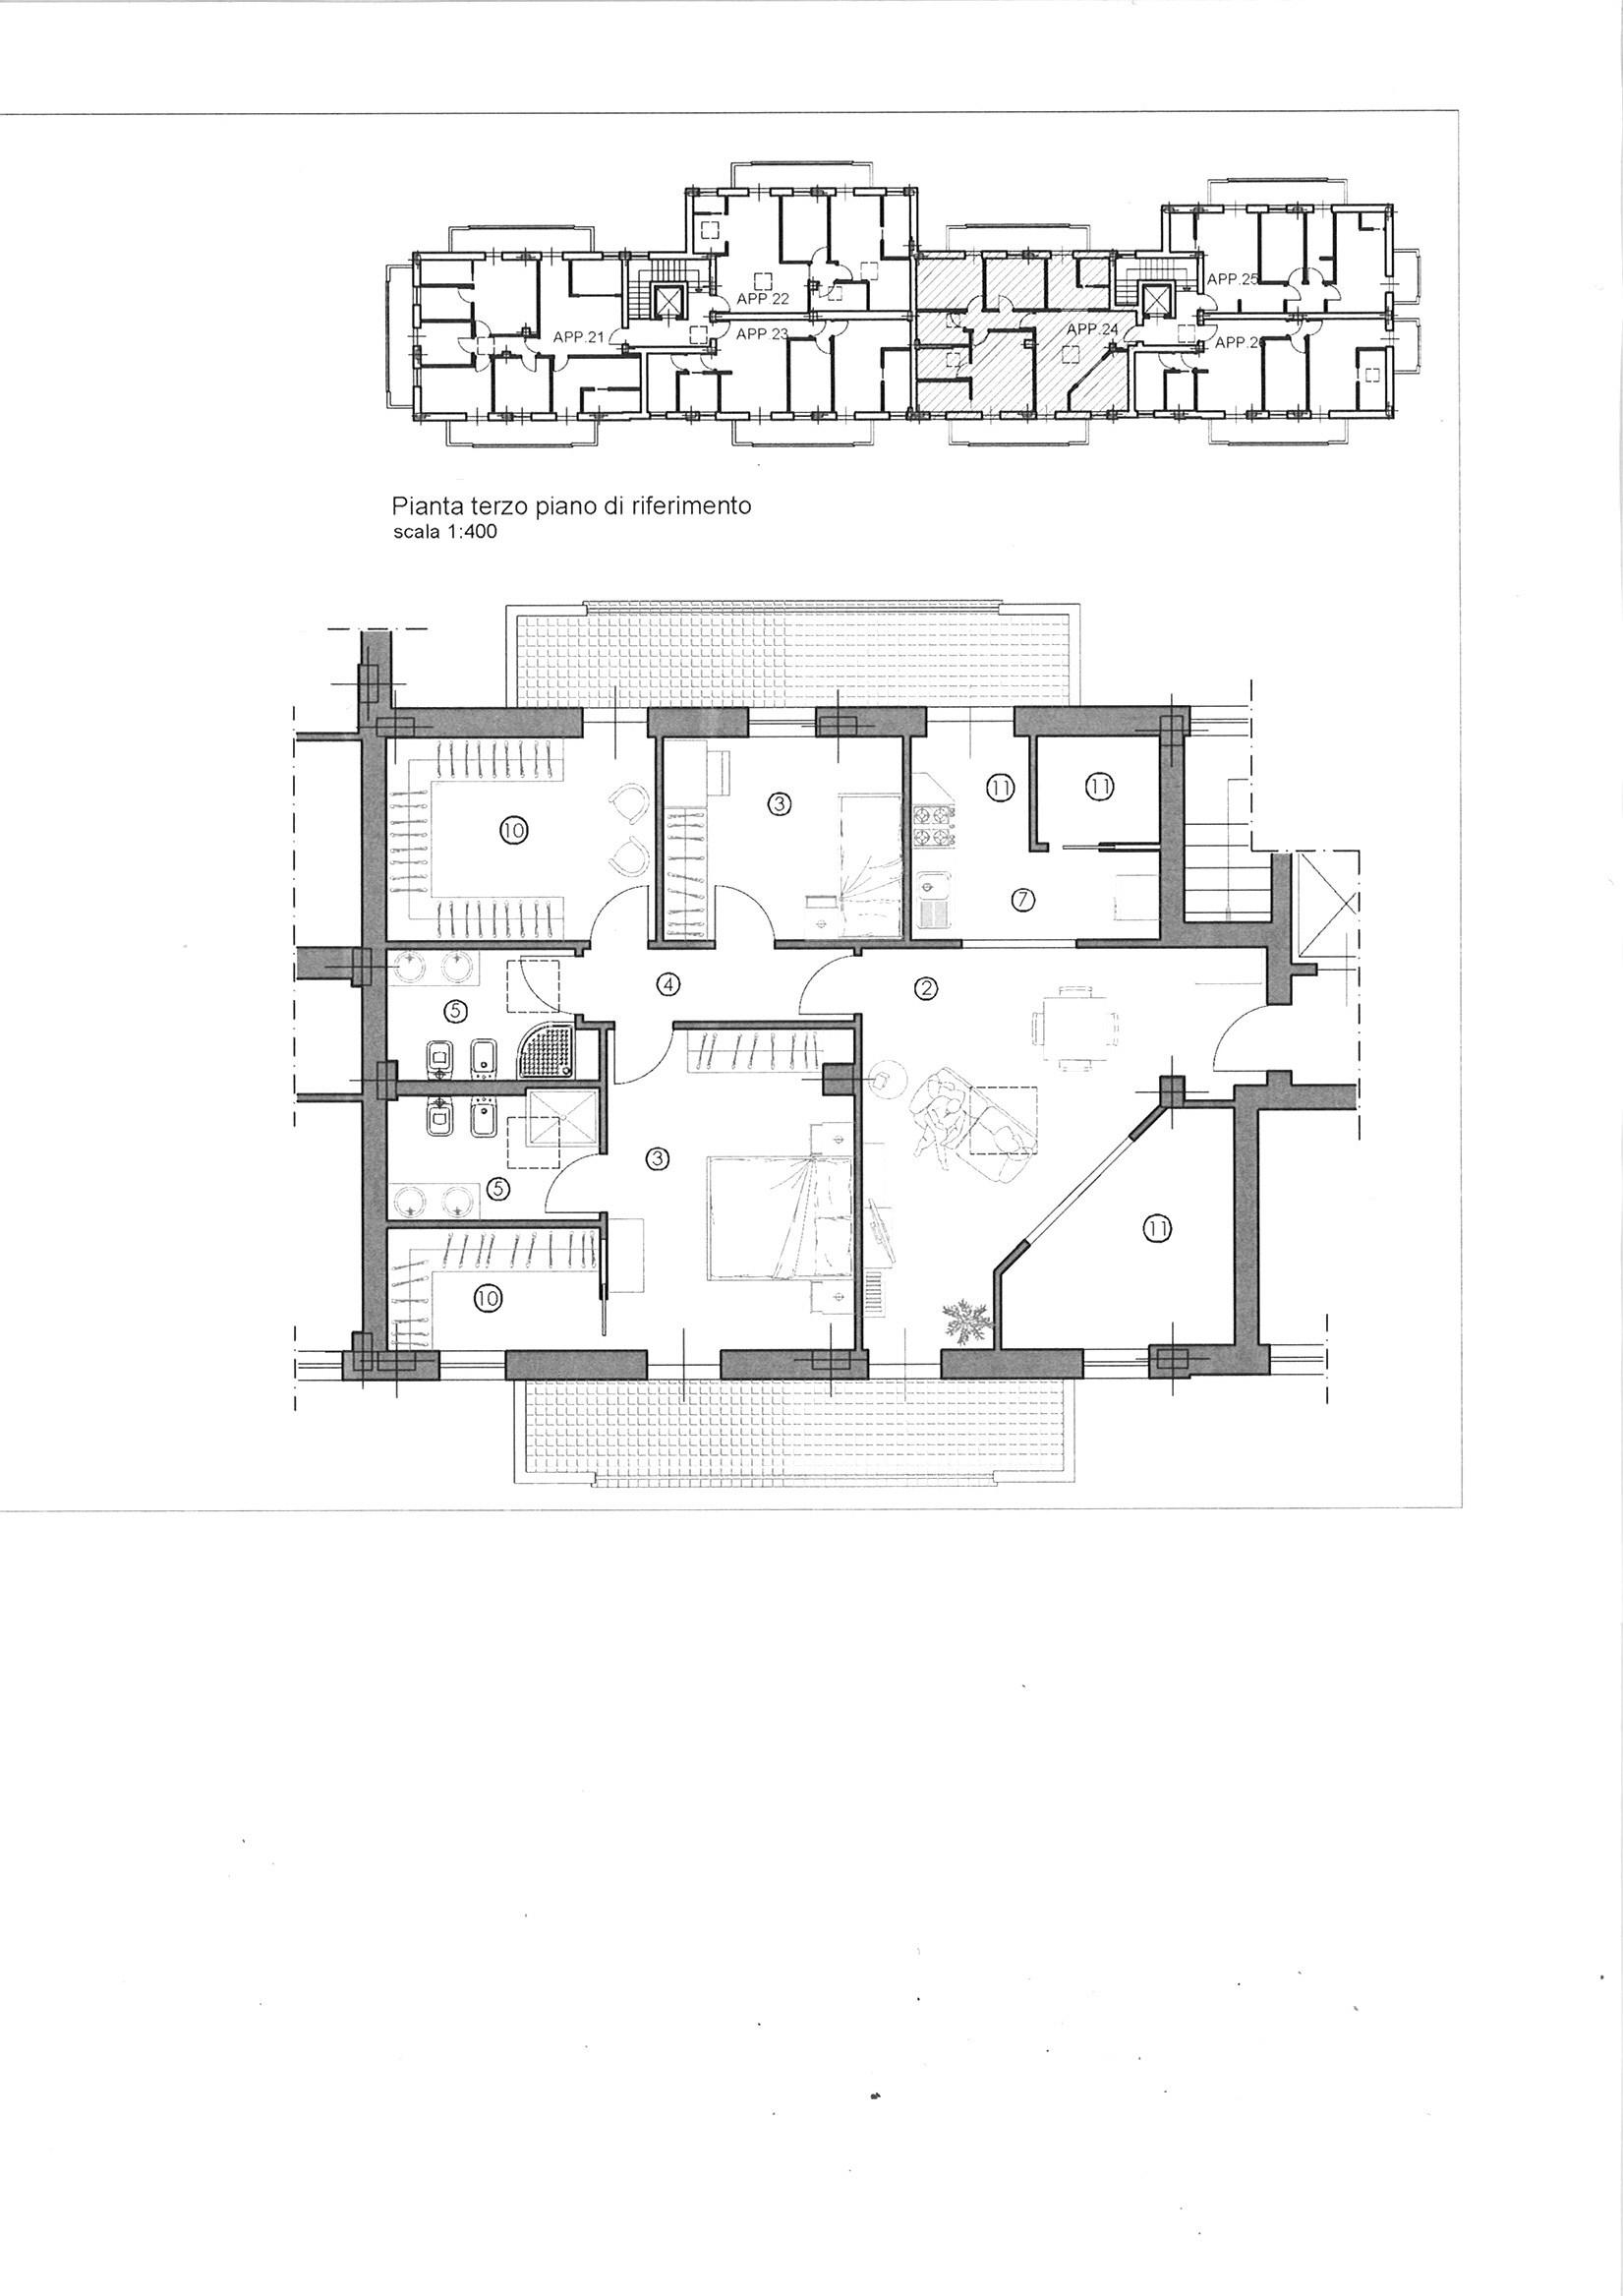 Planimetria 1/1 per rif. ap sconc 320